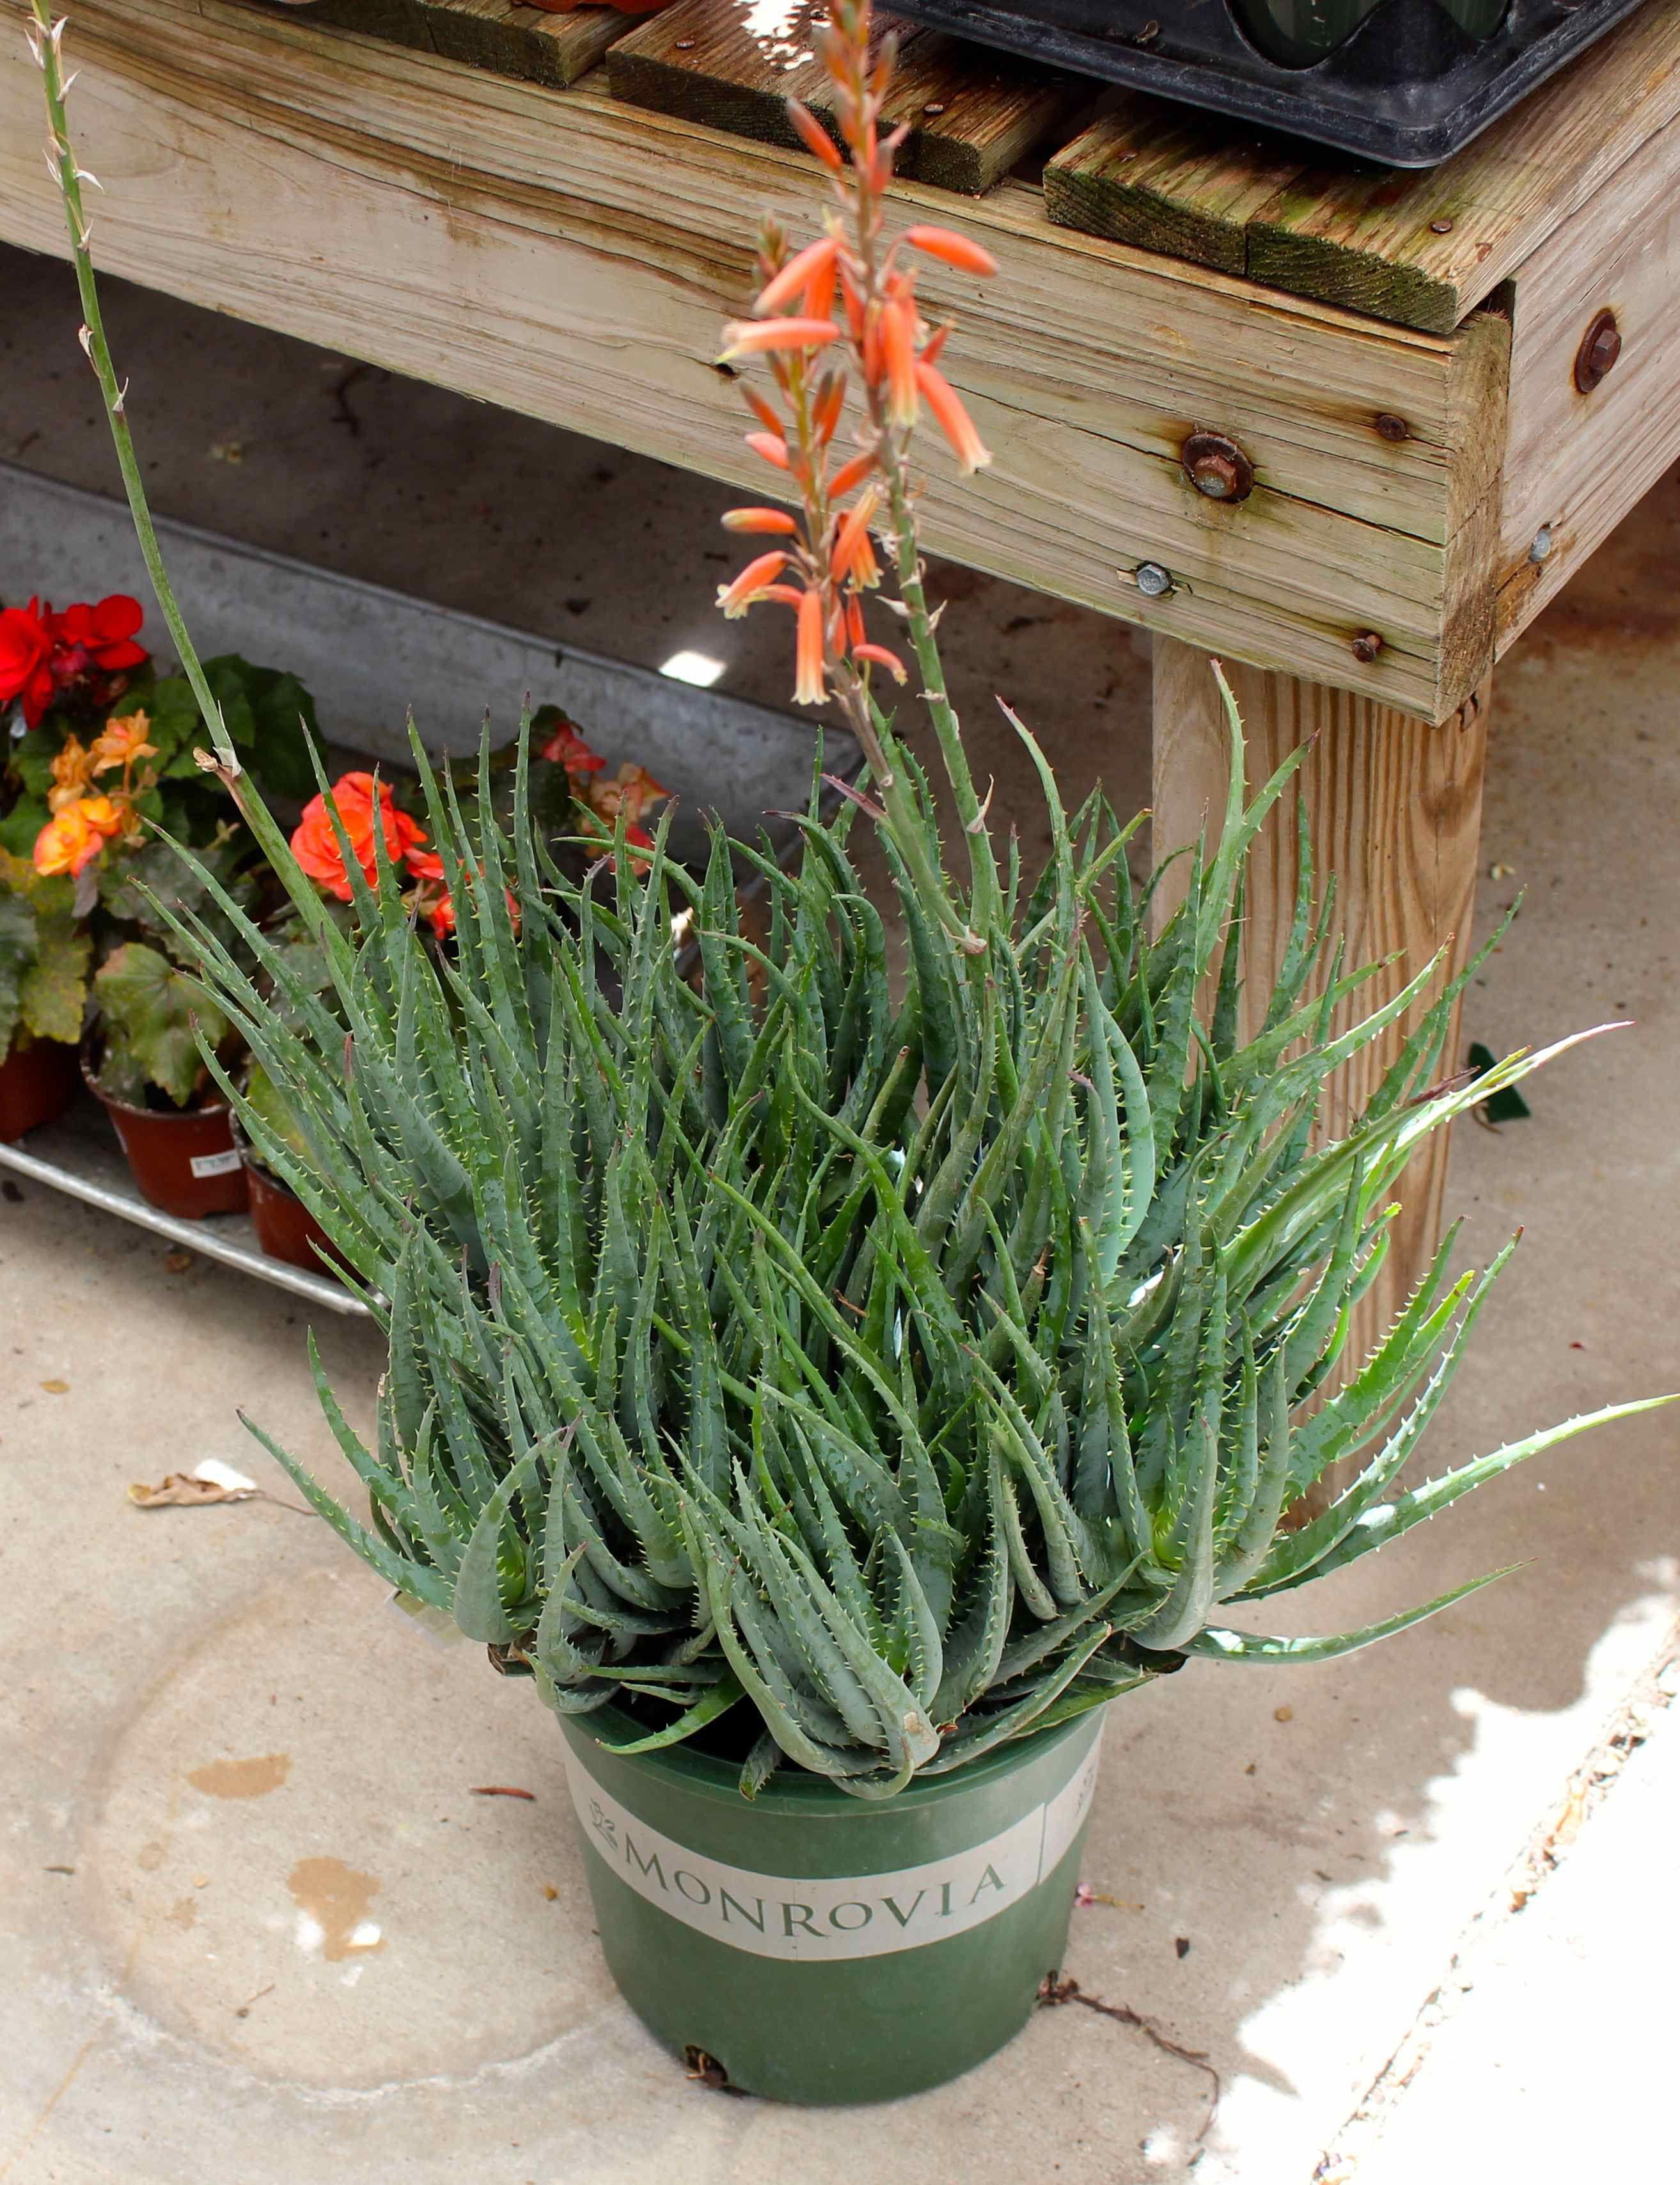 Aloe vera plantsgreat accent in your succulent